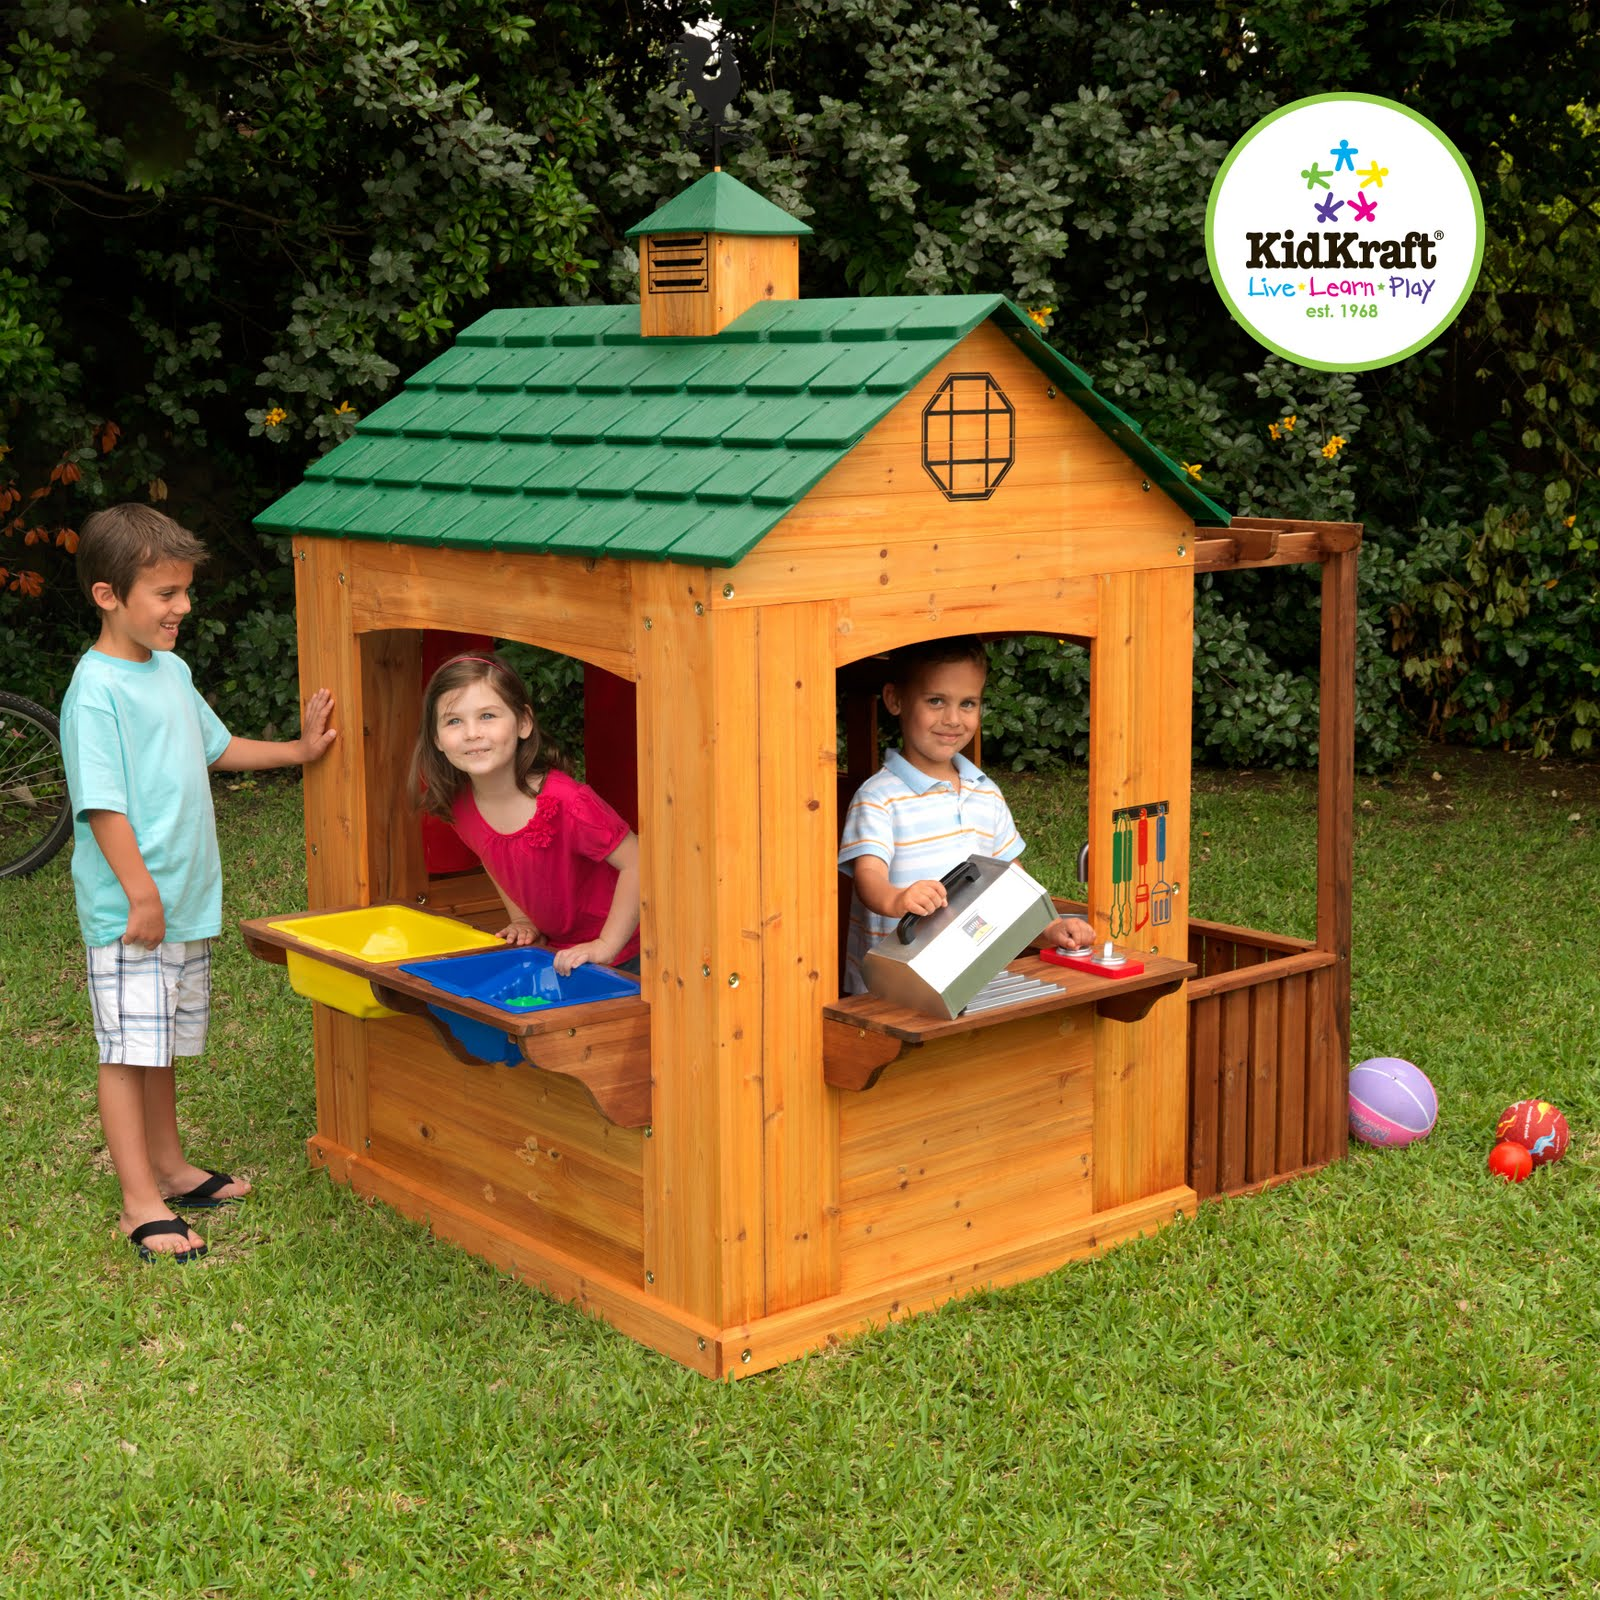 Kidkraft toys furniture summer fun with kidkraft 39 s for Play house children